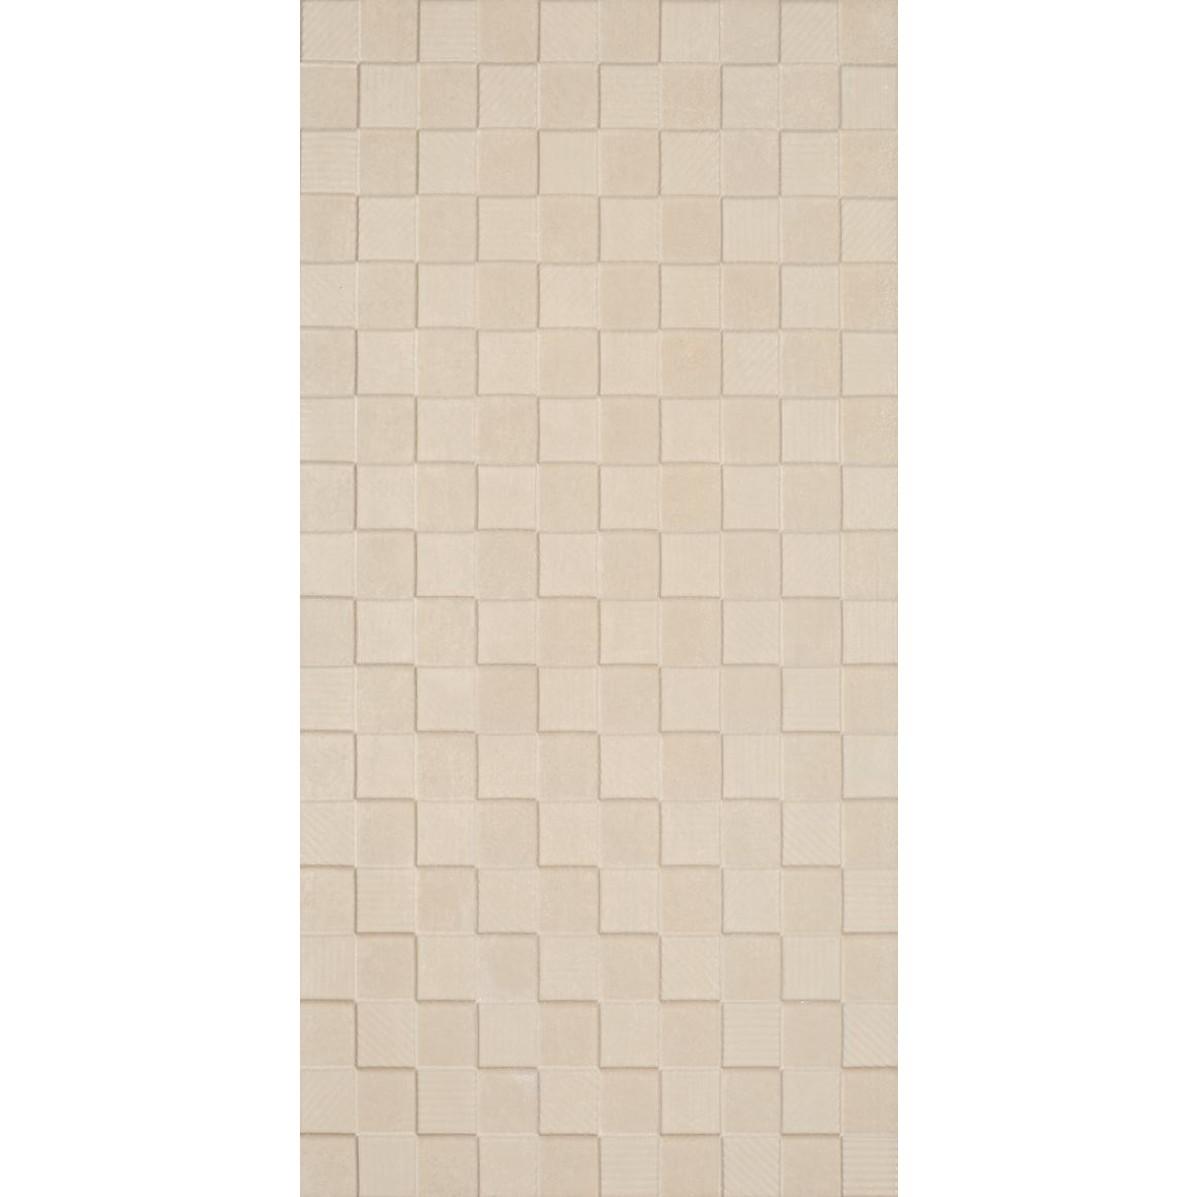 Ceramica Tipo A 45x90 cm Jacquard 164m Bege - Pointer